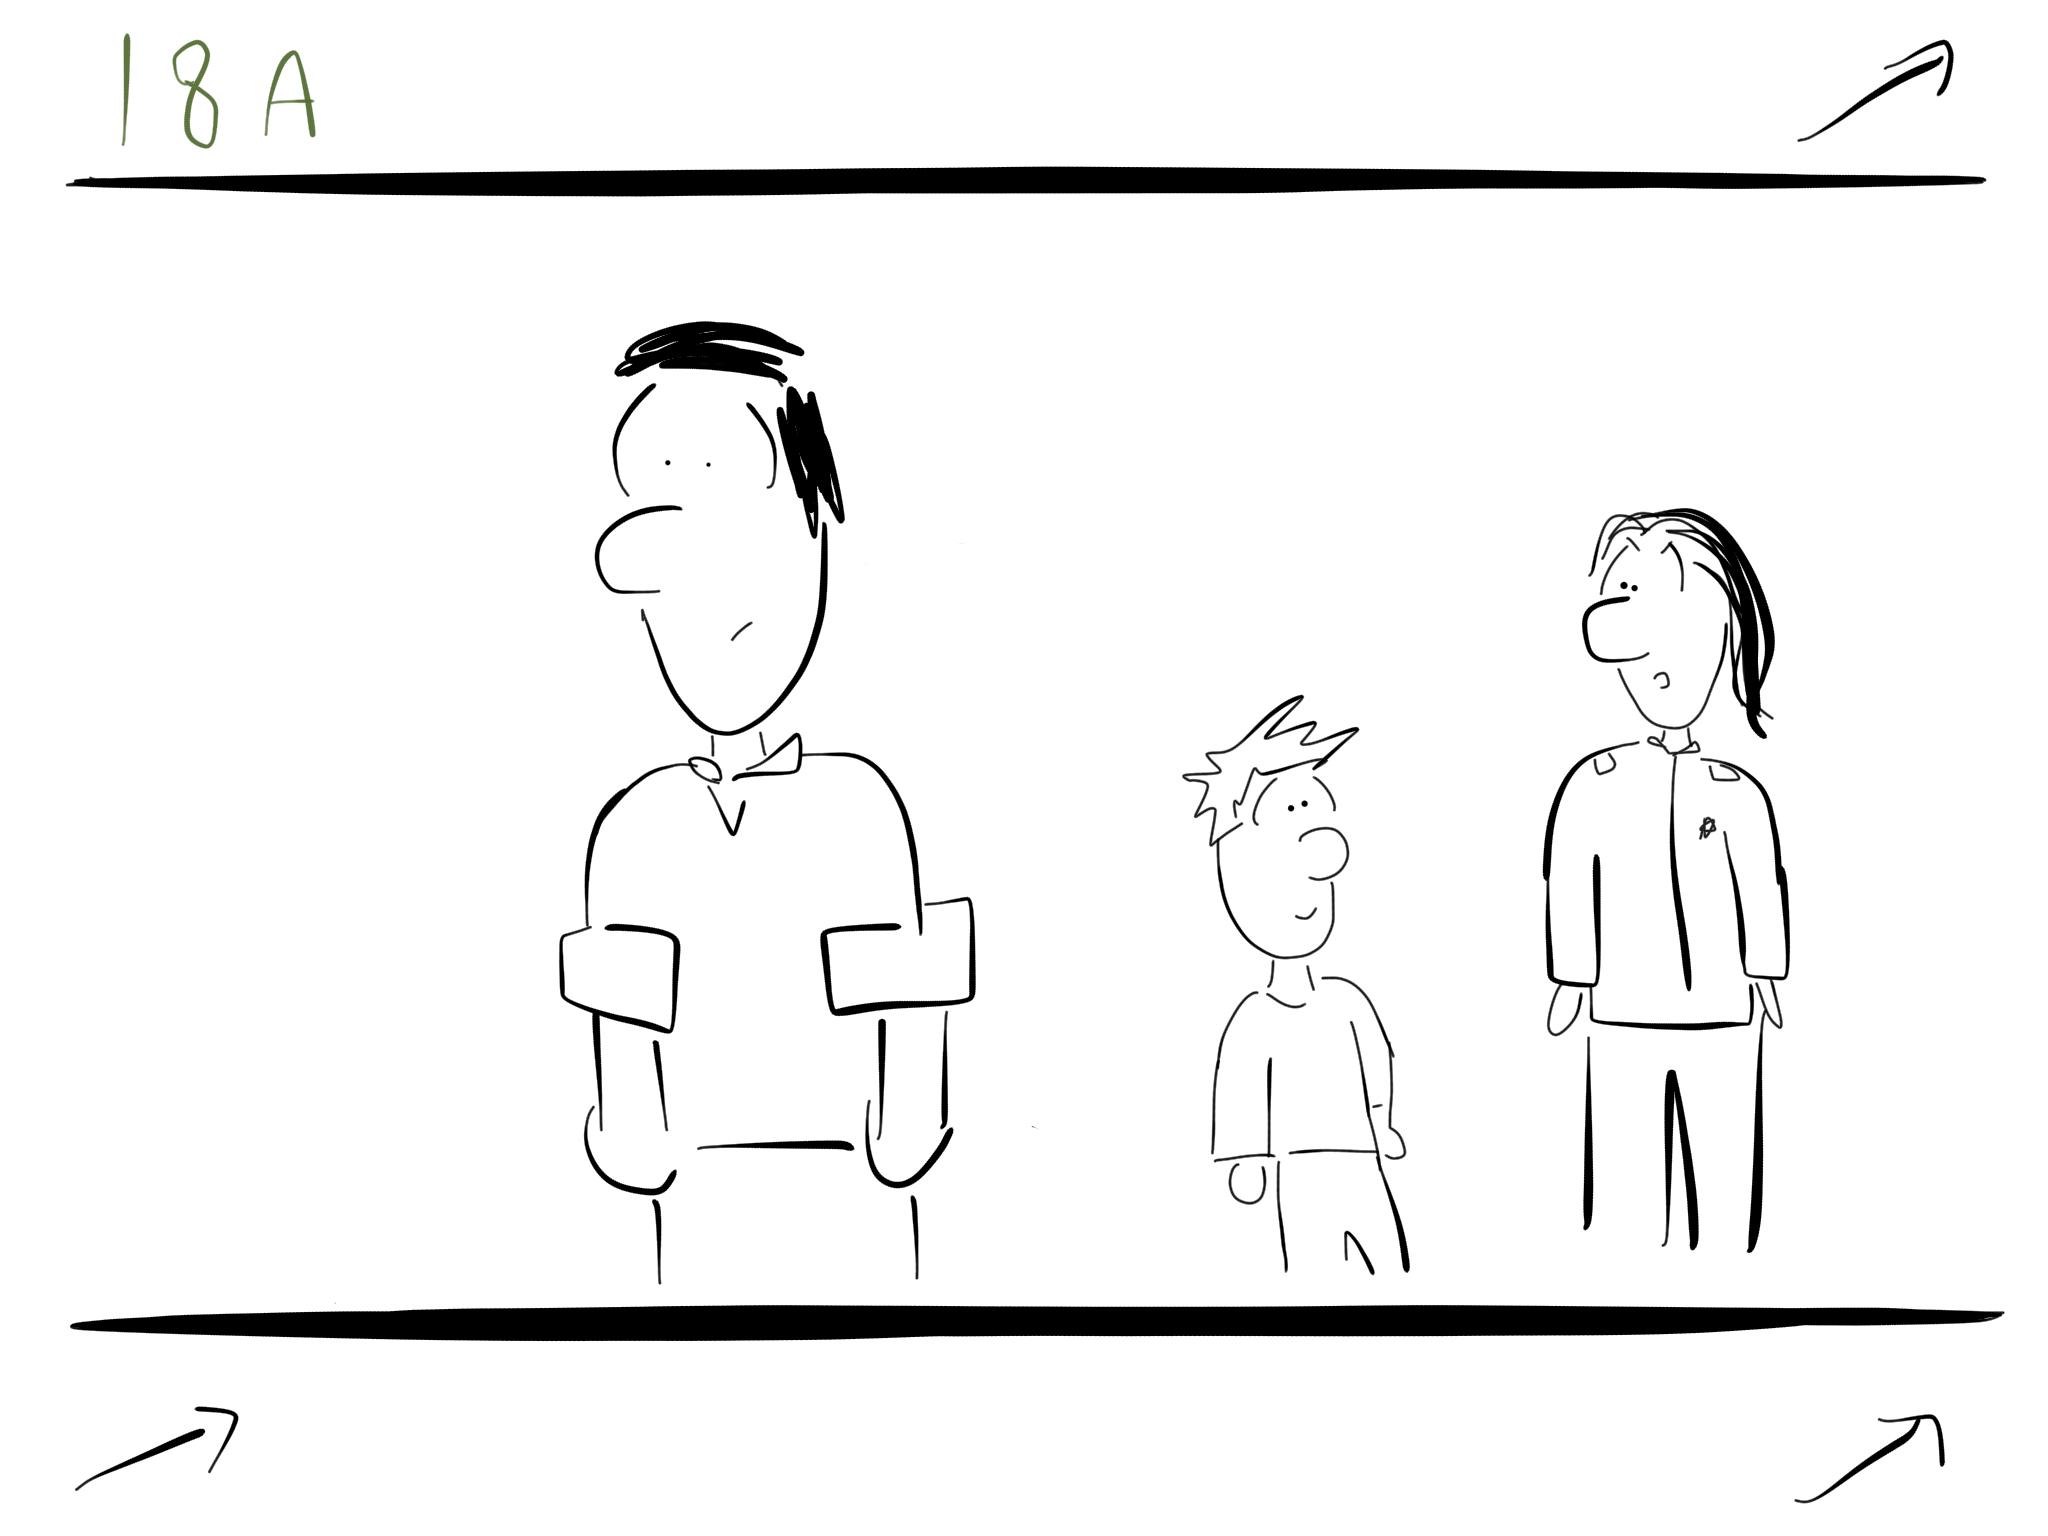 BDF_Storyboards_83.jpg